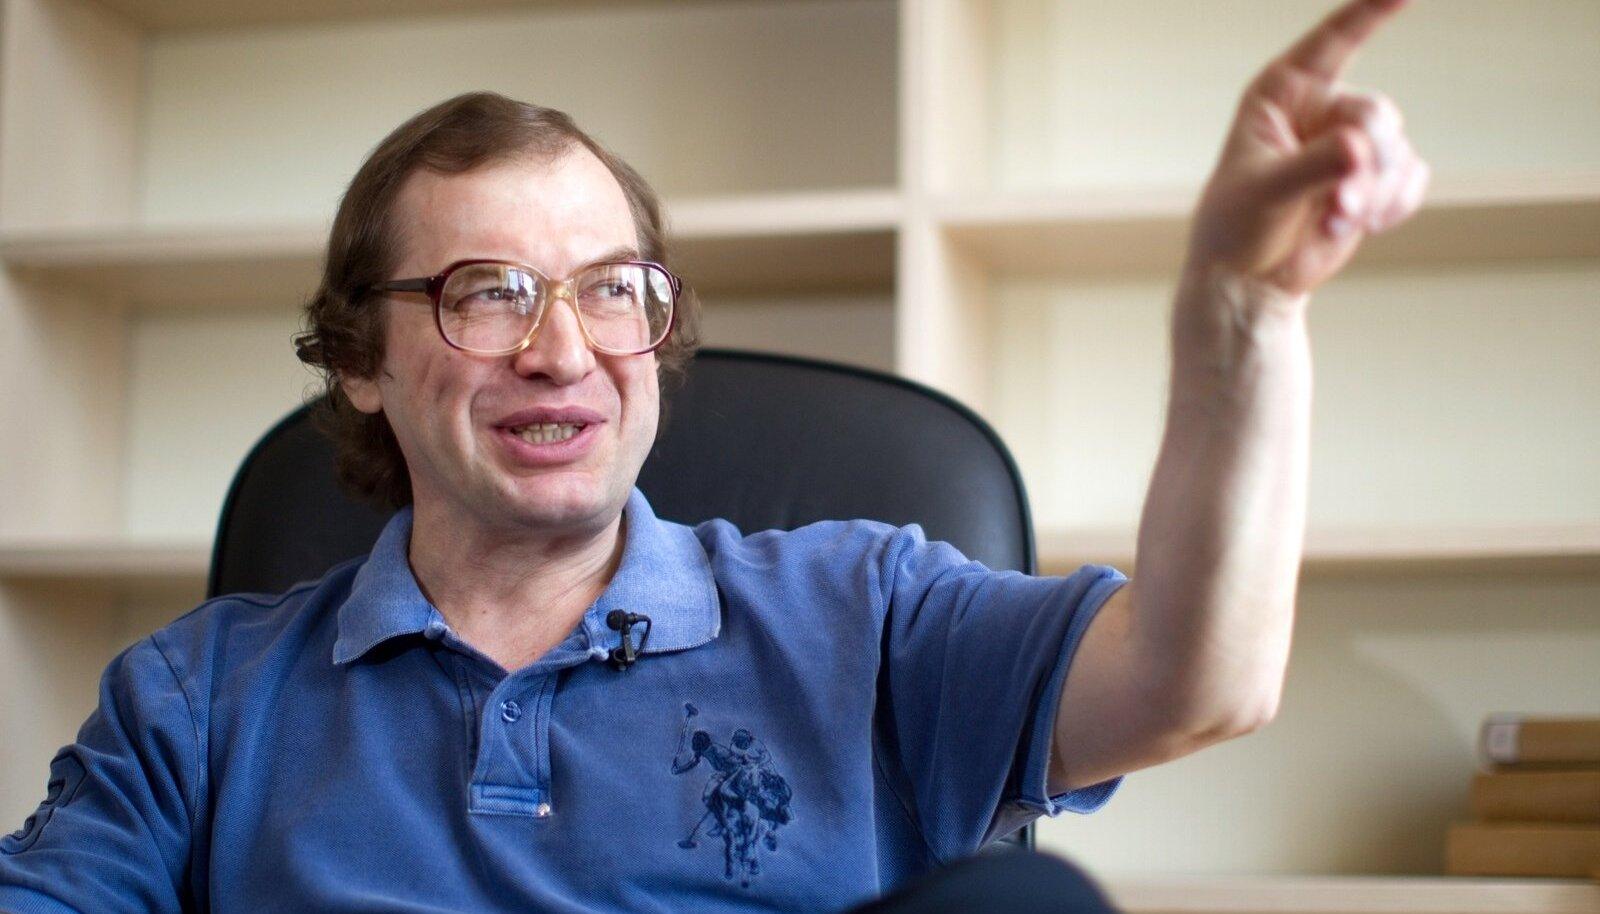 Entrepreneur Sergei Mavrodi gives interview